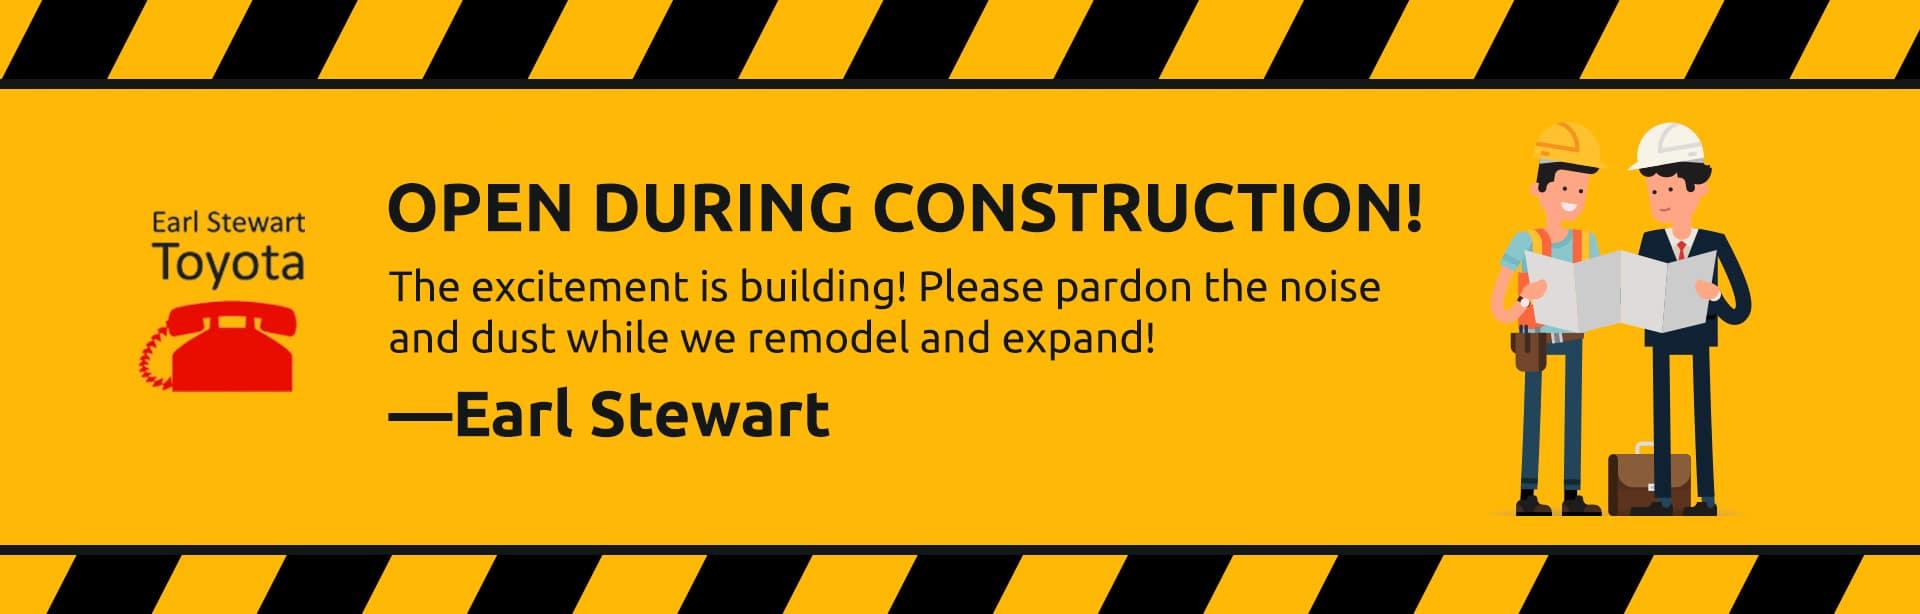 earl stewart toyota open during construction